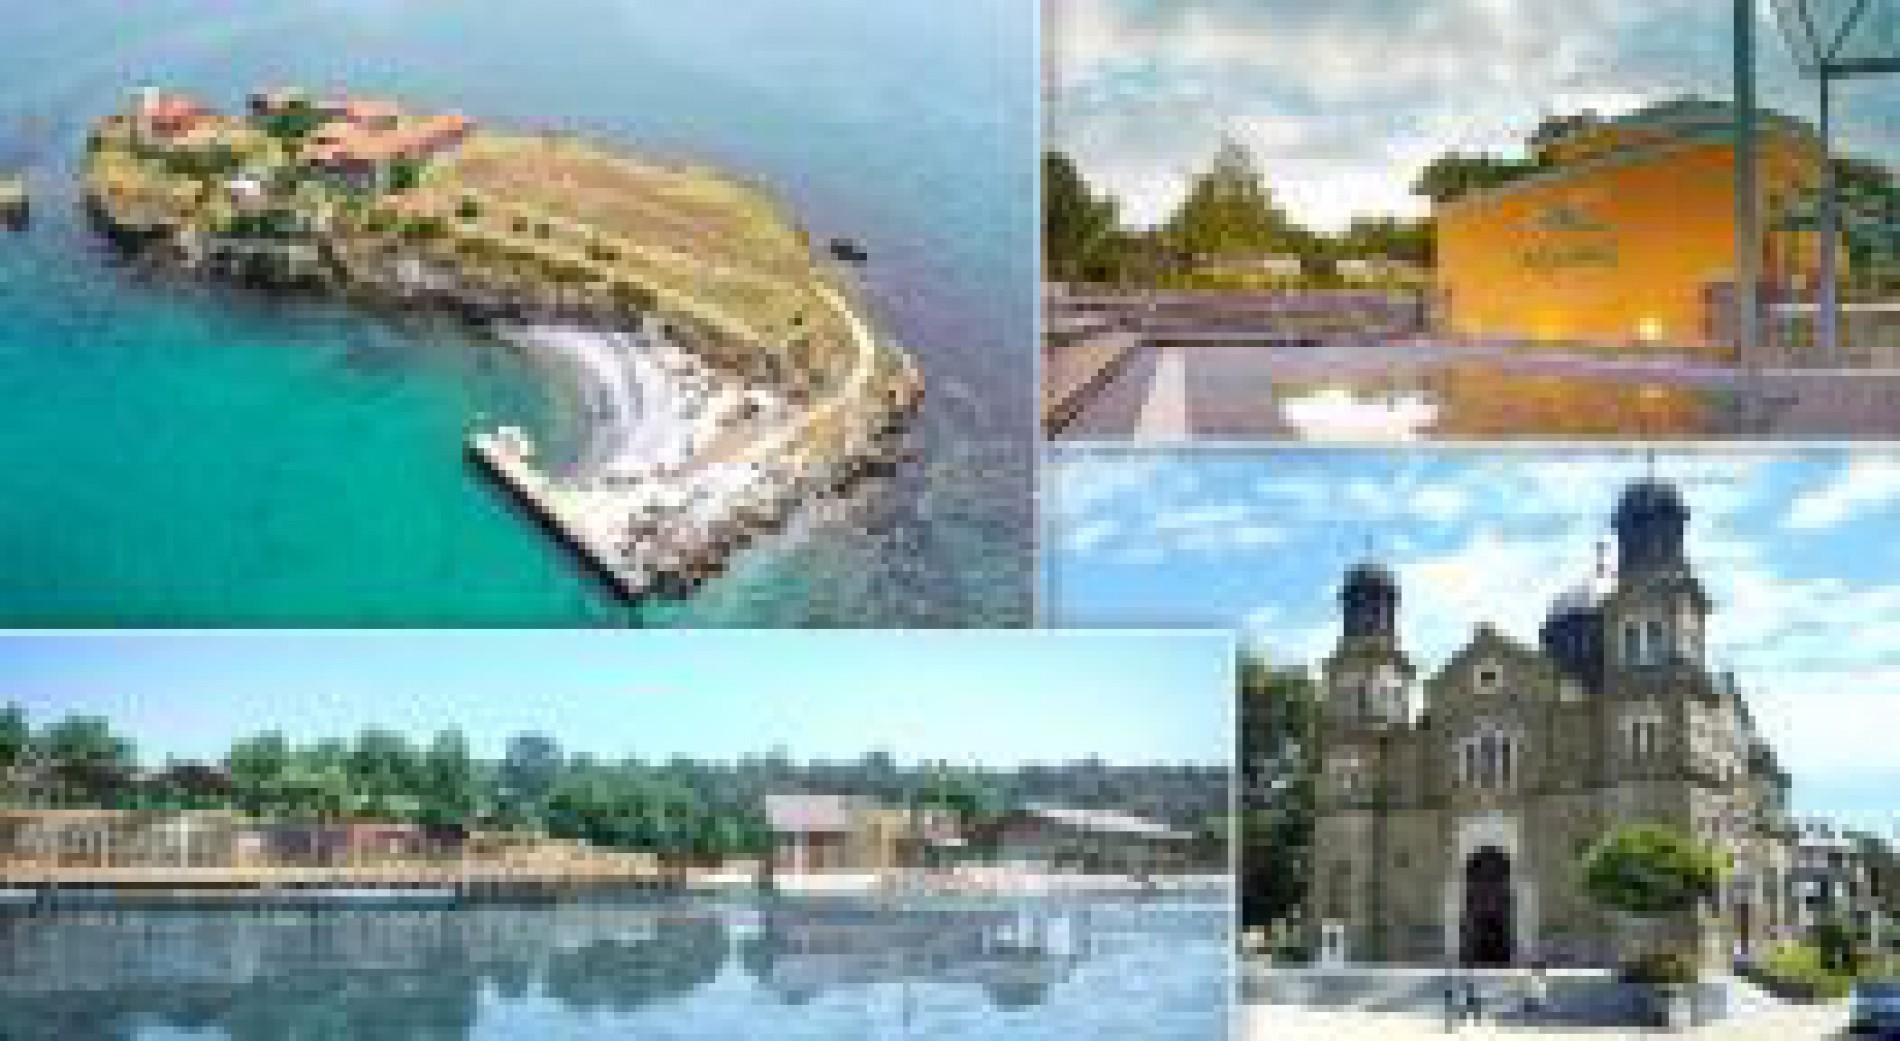 A new tourist route will present Burgas as an interesting tourist destination